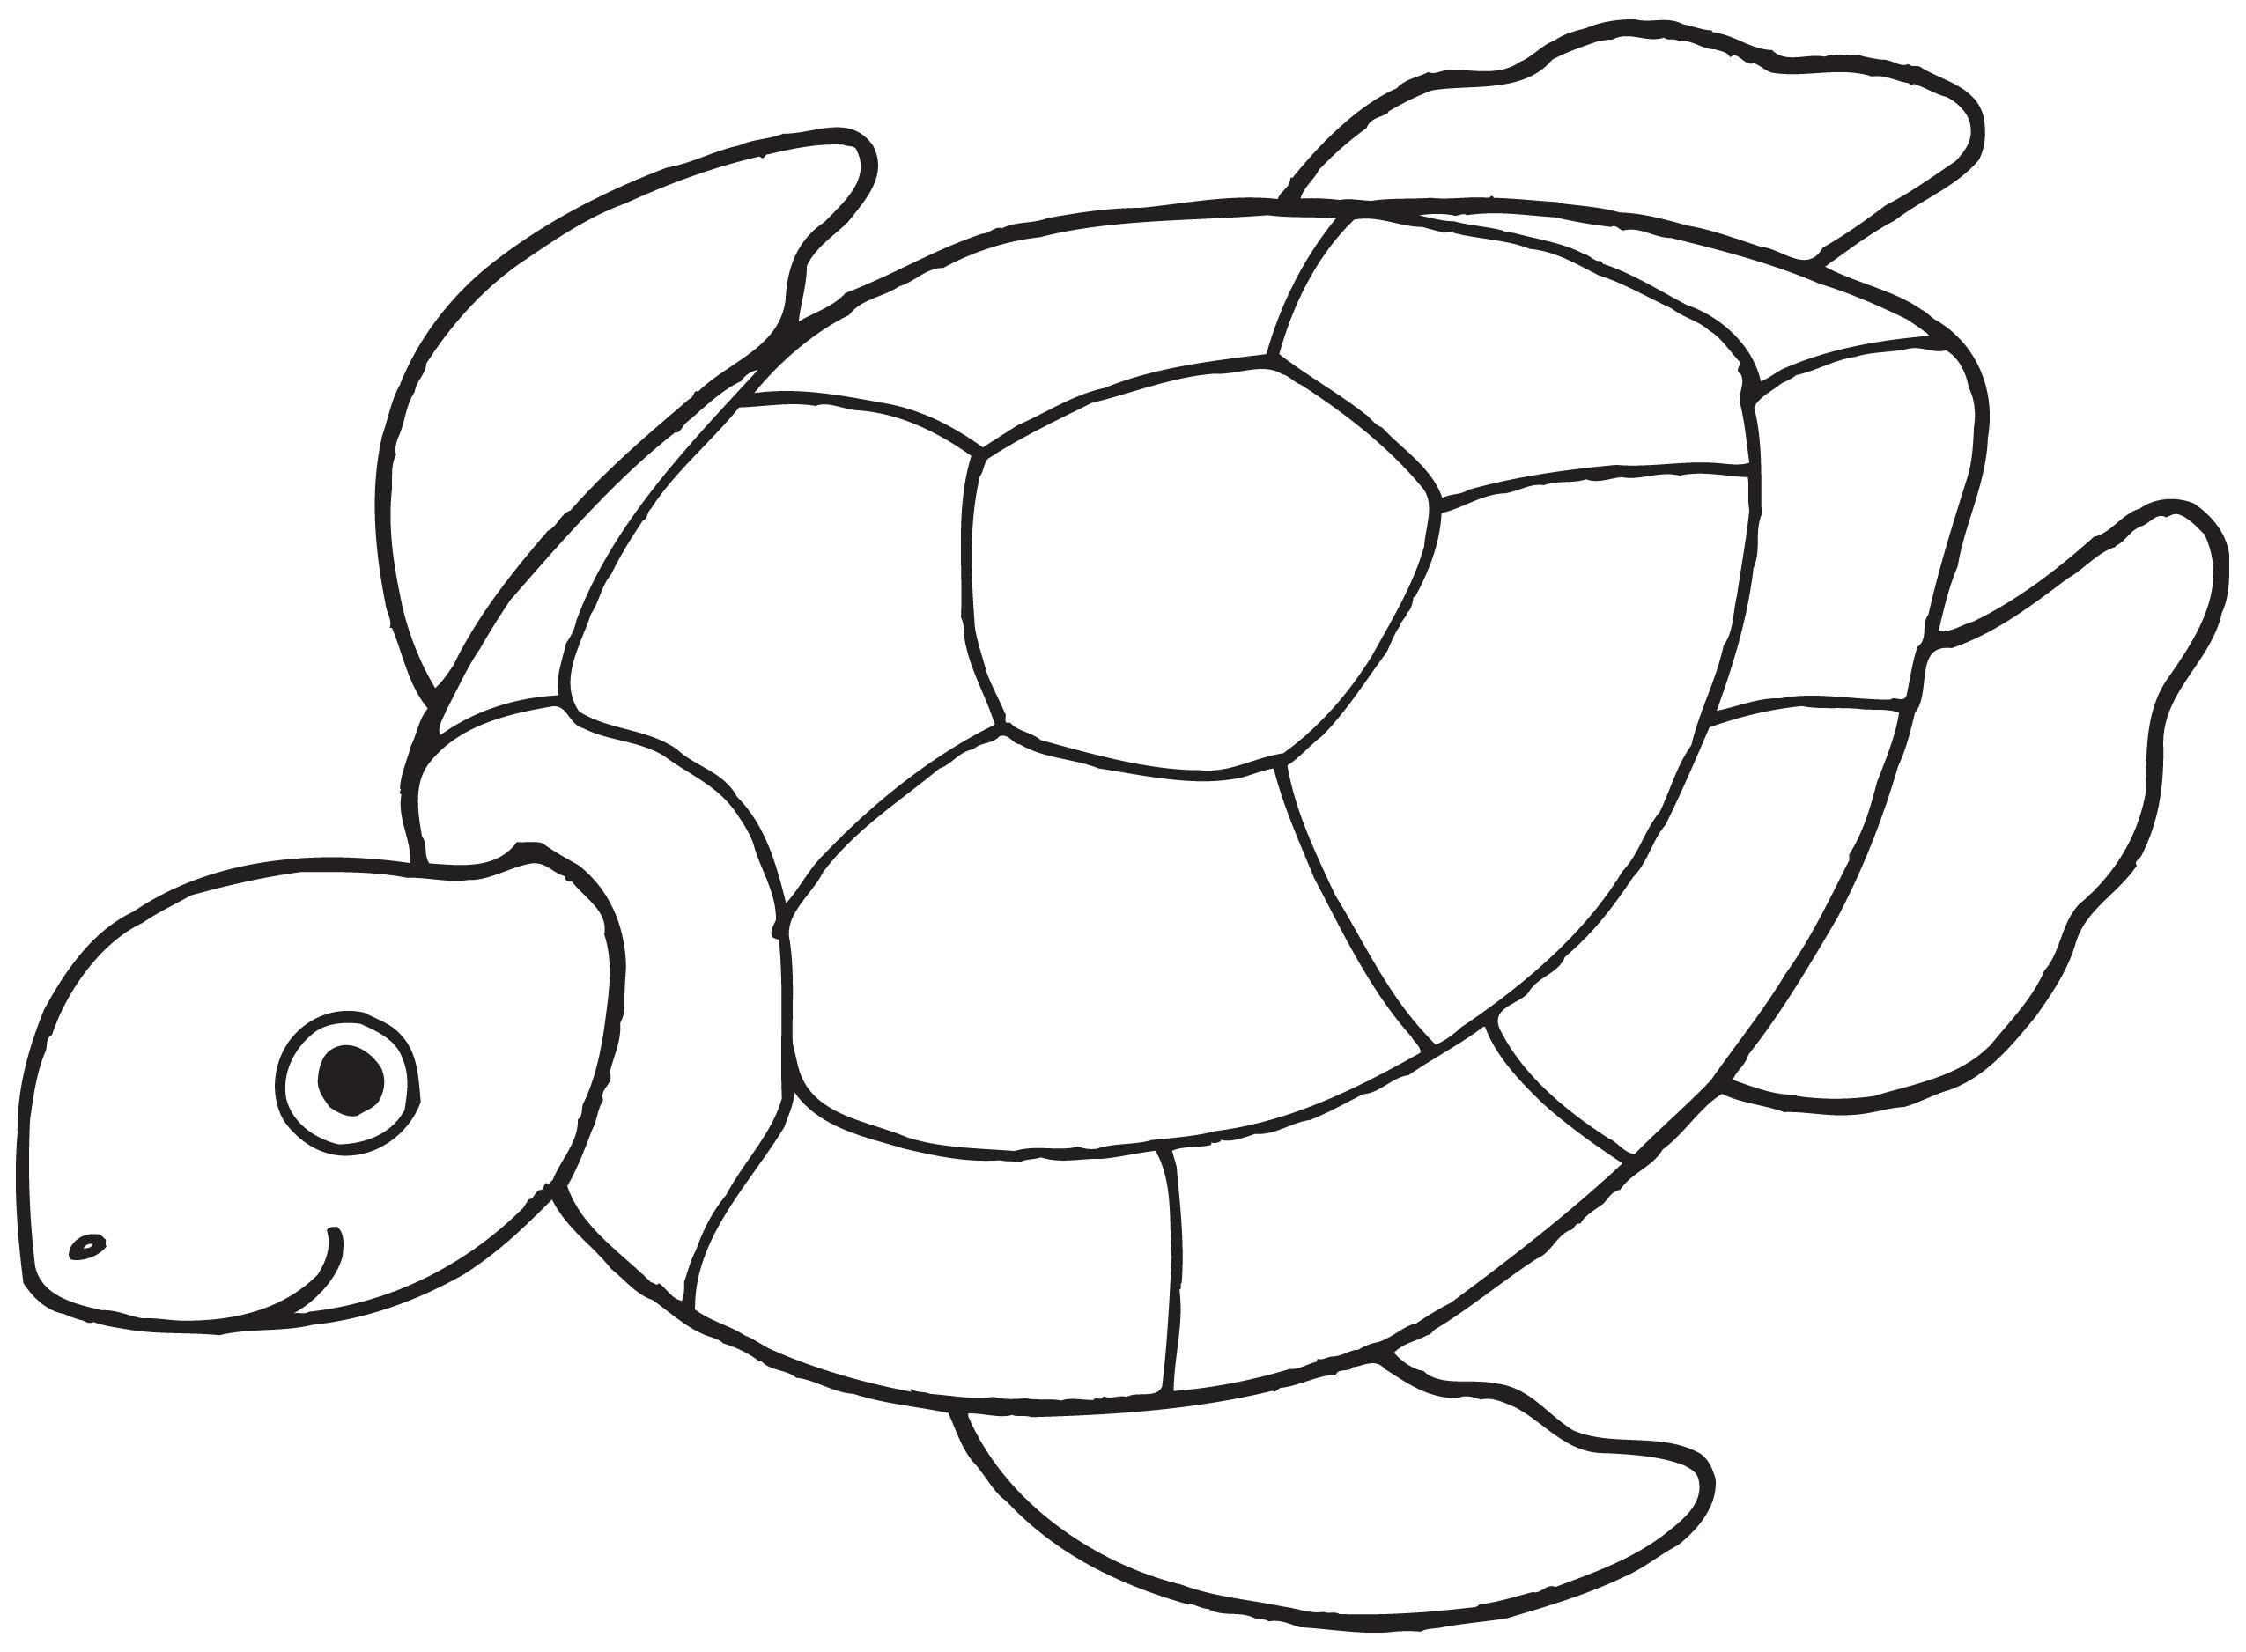 2550x1876 Easy Sea Turtle Drawing How To Draw A Sea Turtle, Cartoon Sea